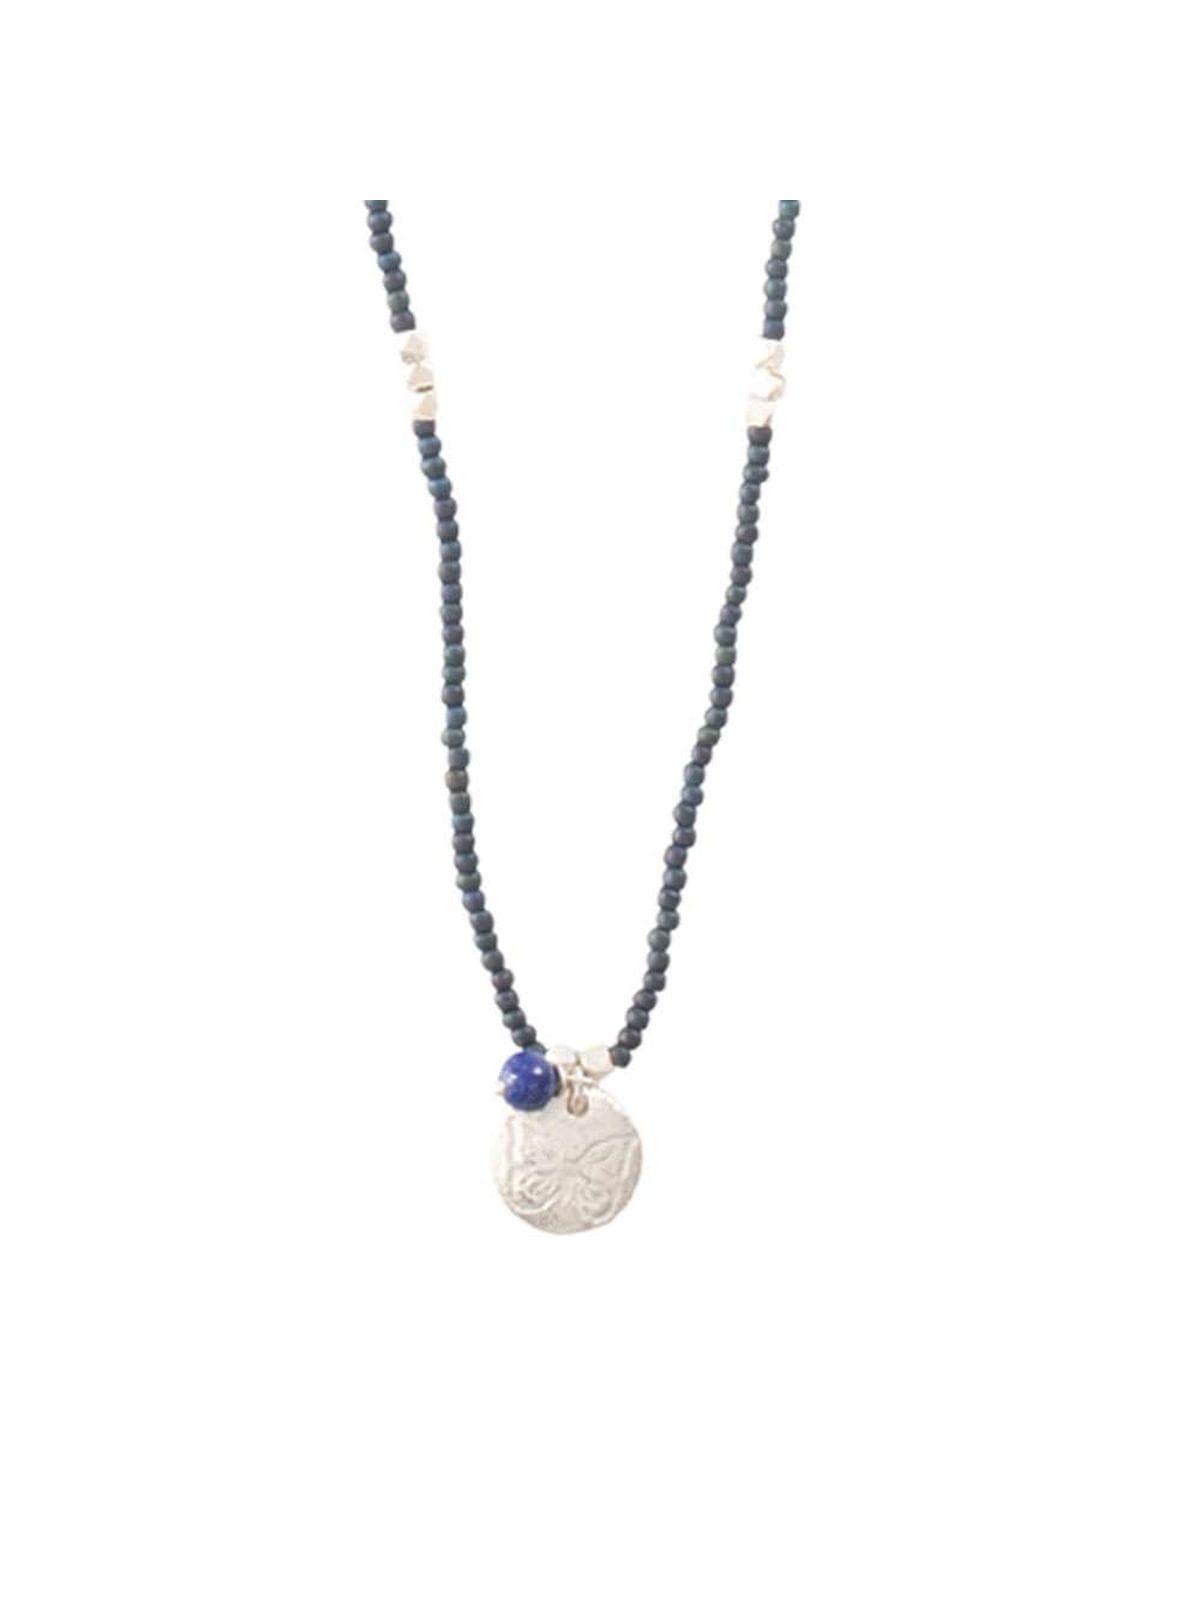 bl23559-fall-lapis-lazuli-butterfly-coin-silver-necklacevL3iJG3AeC6cK_600x600@2x_1200x1600